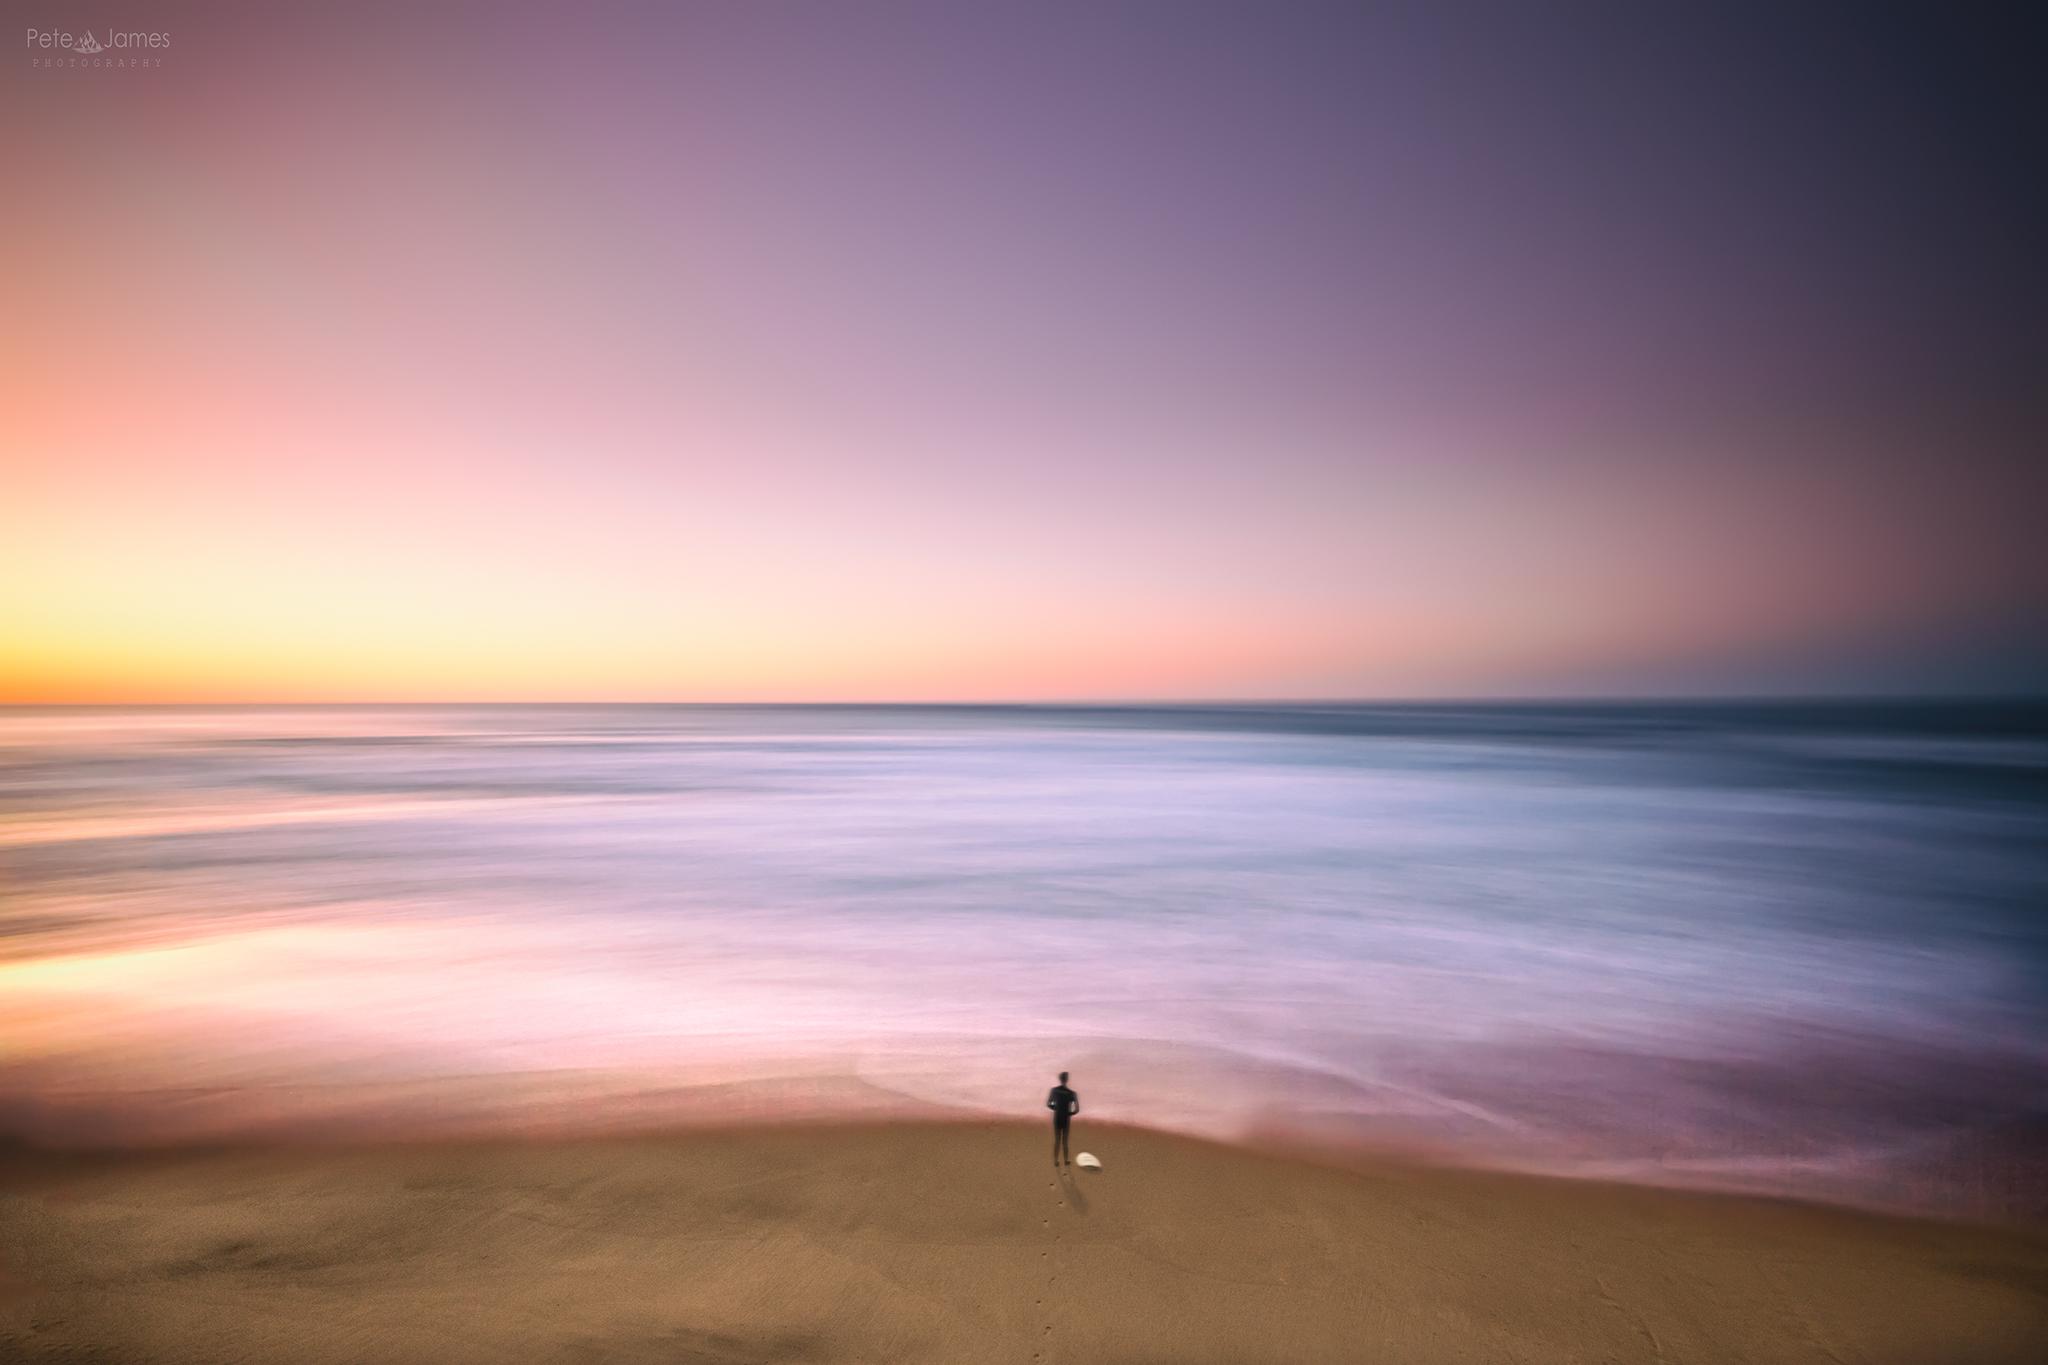 Contemplation - 13th Beach Barwon Heads